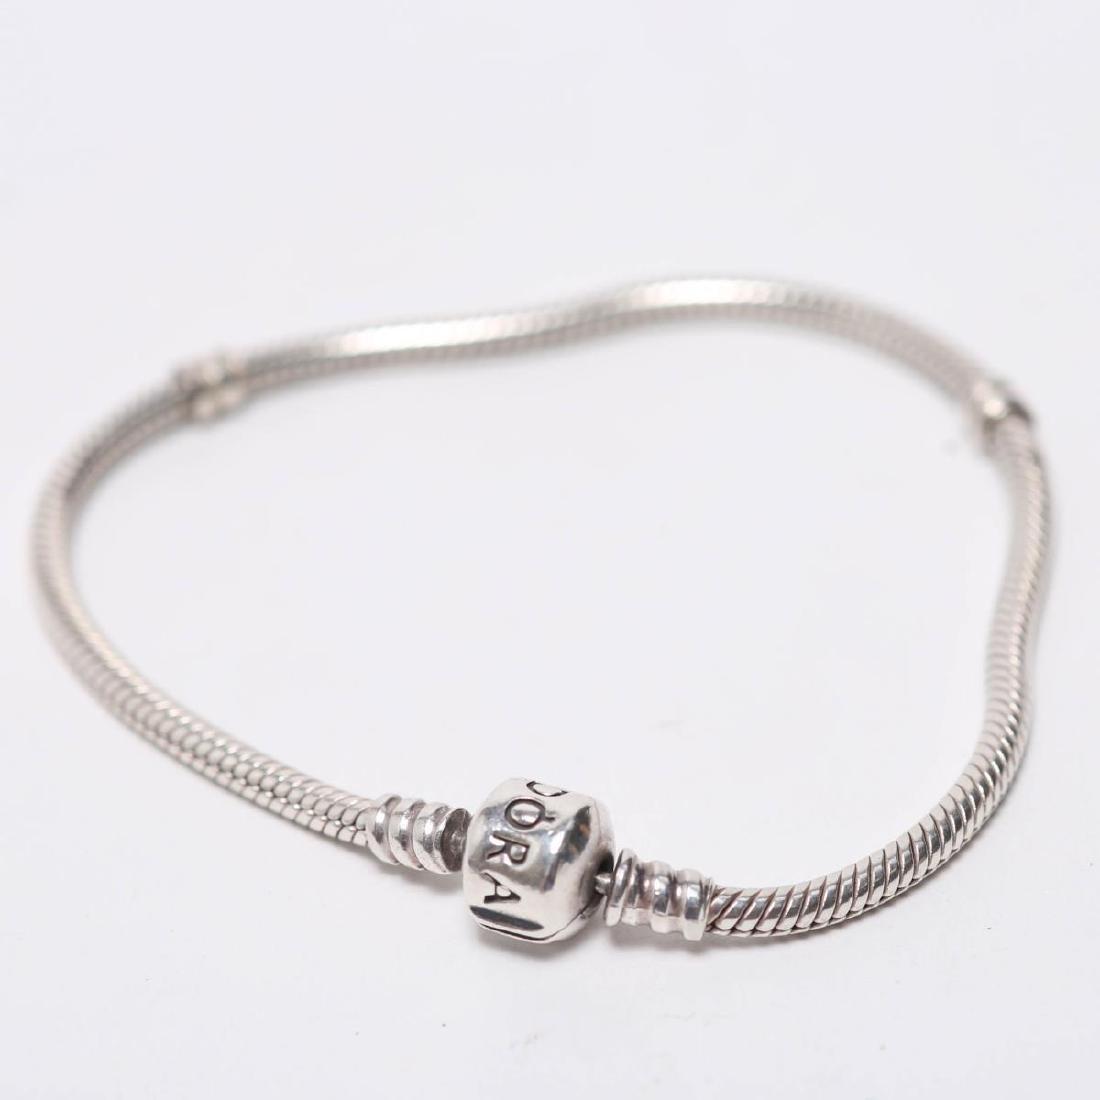 Pandora Bracelet, Silver Chain for Charms